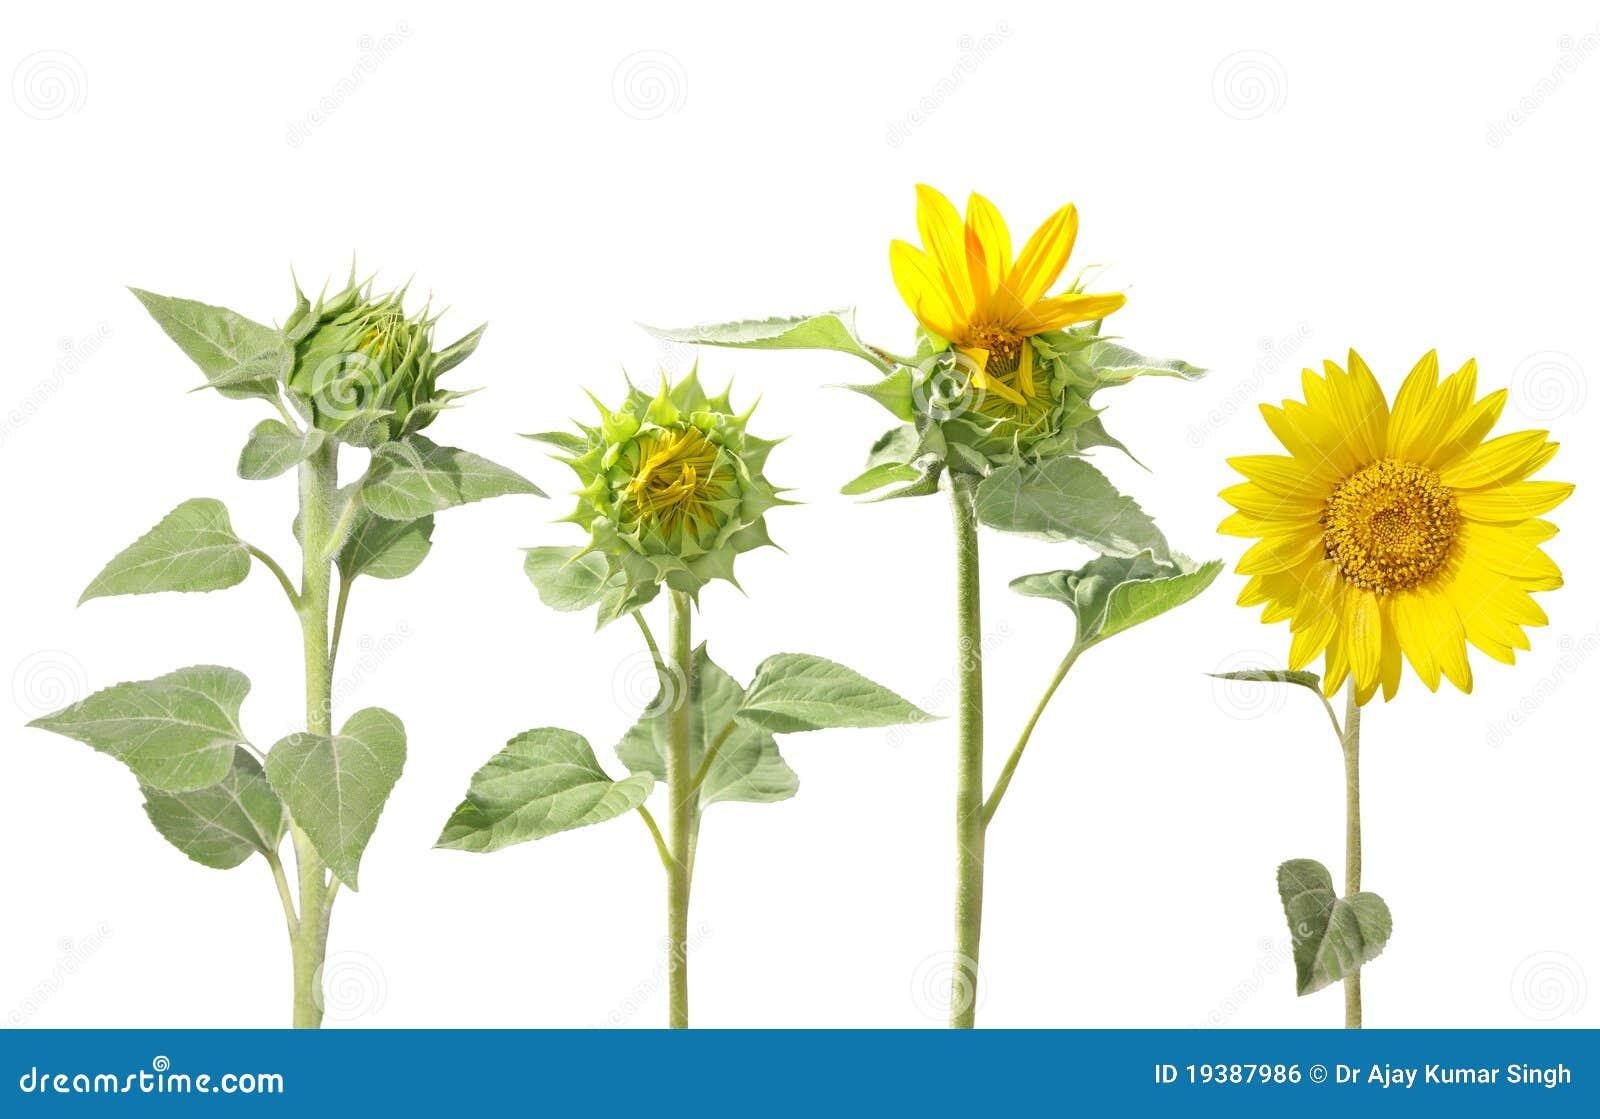 Sunflower Bud Photograph by Sheri McLeroy  |Sunflower Bud